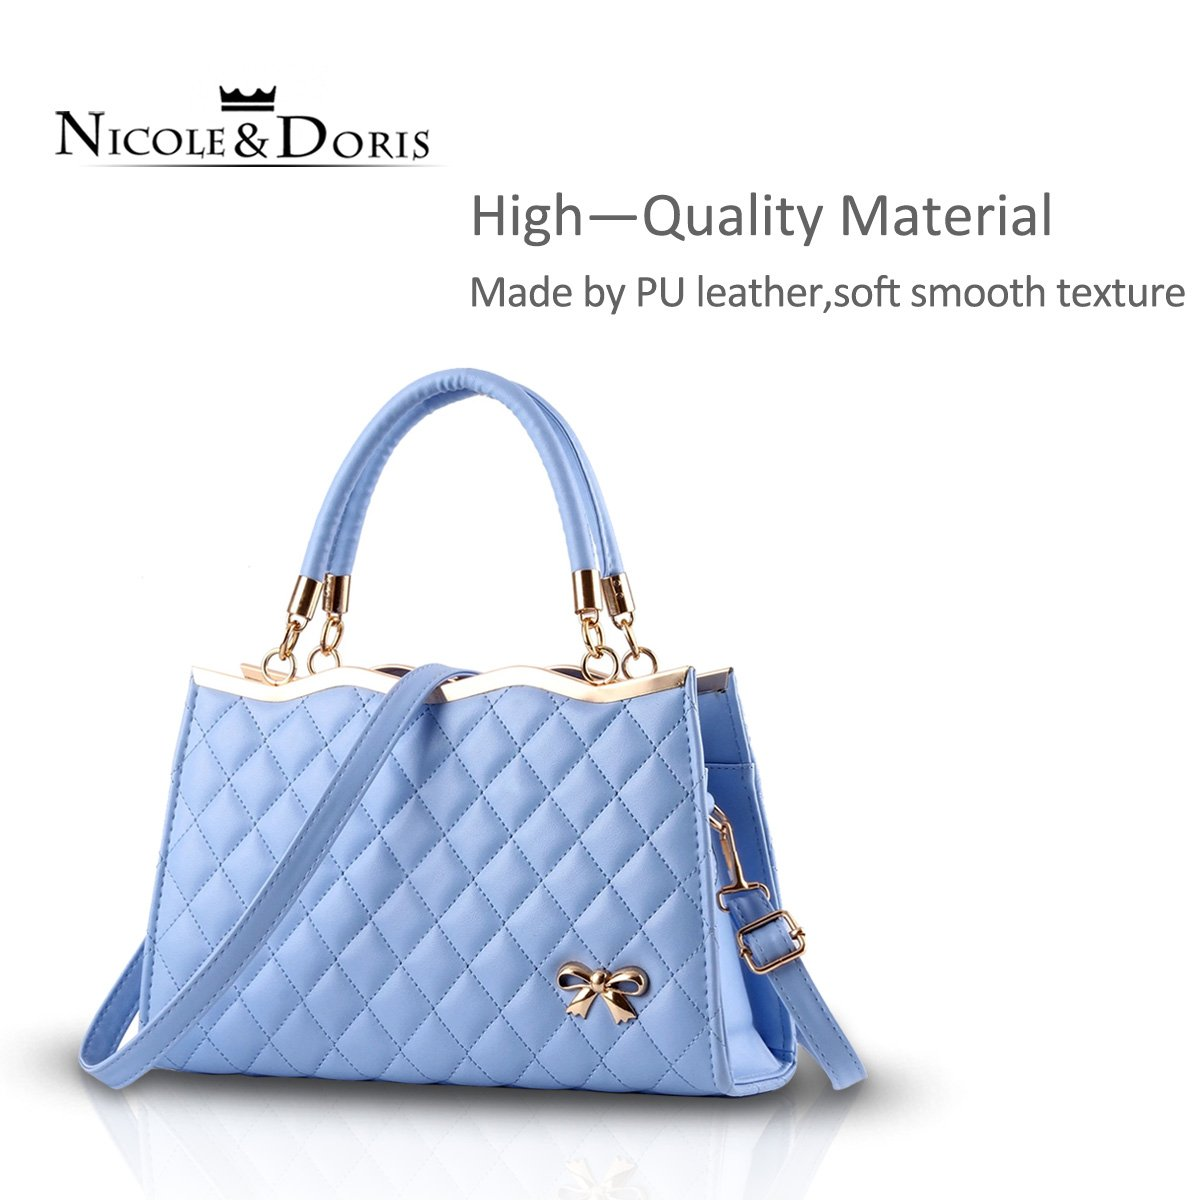 00d470da66a Nicole Doris New Women Ladies Handbag Shoulder Crossbody Bag Soft Surface  PU Leather Diamond Lattice Azure  Handbags  Amazon.com